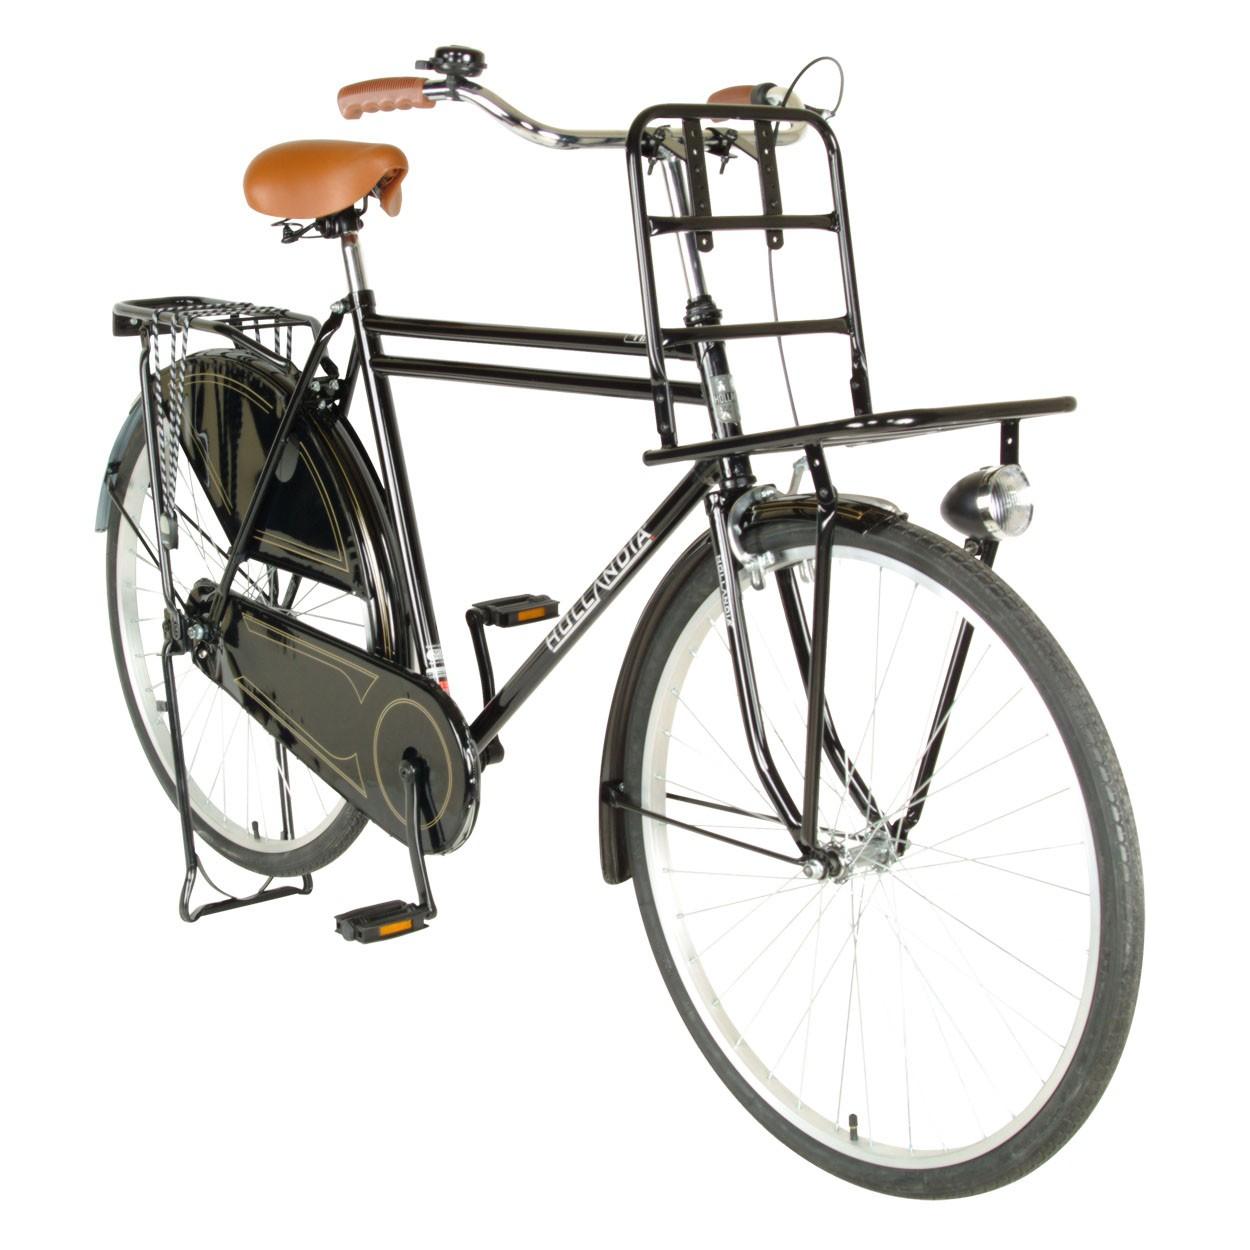 Hollandia Opa 28 inch Bike